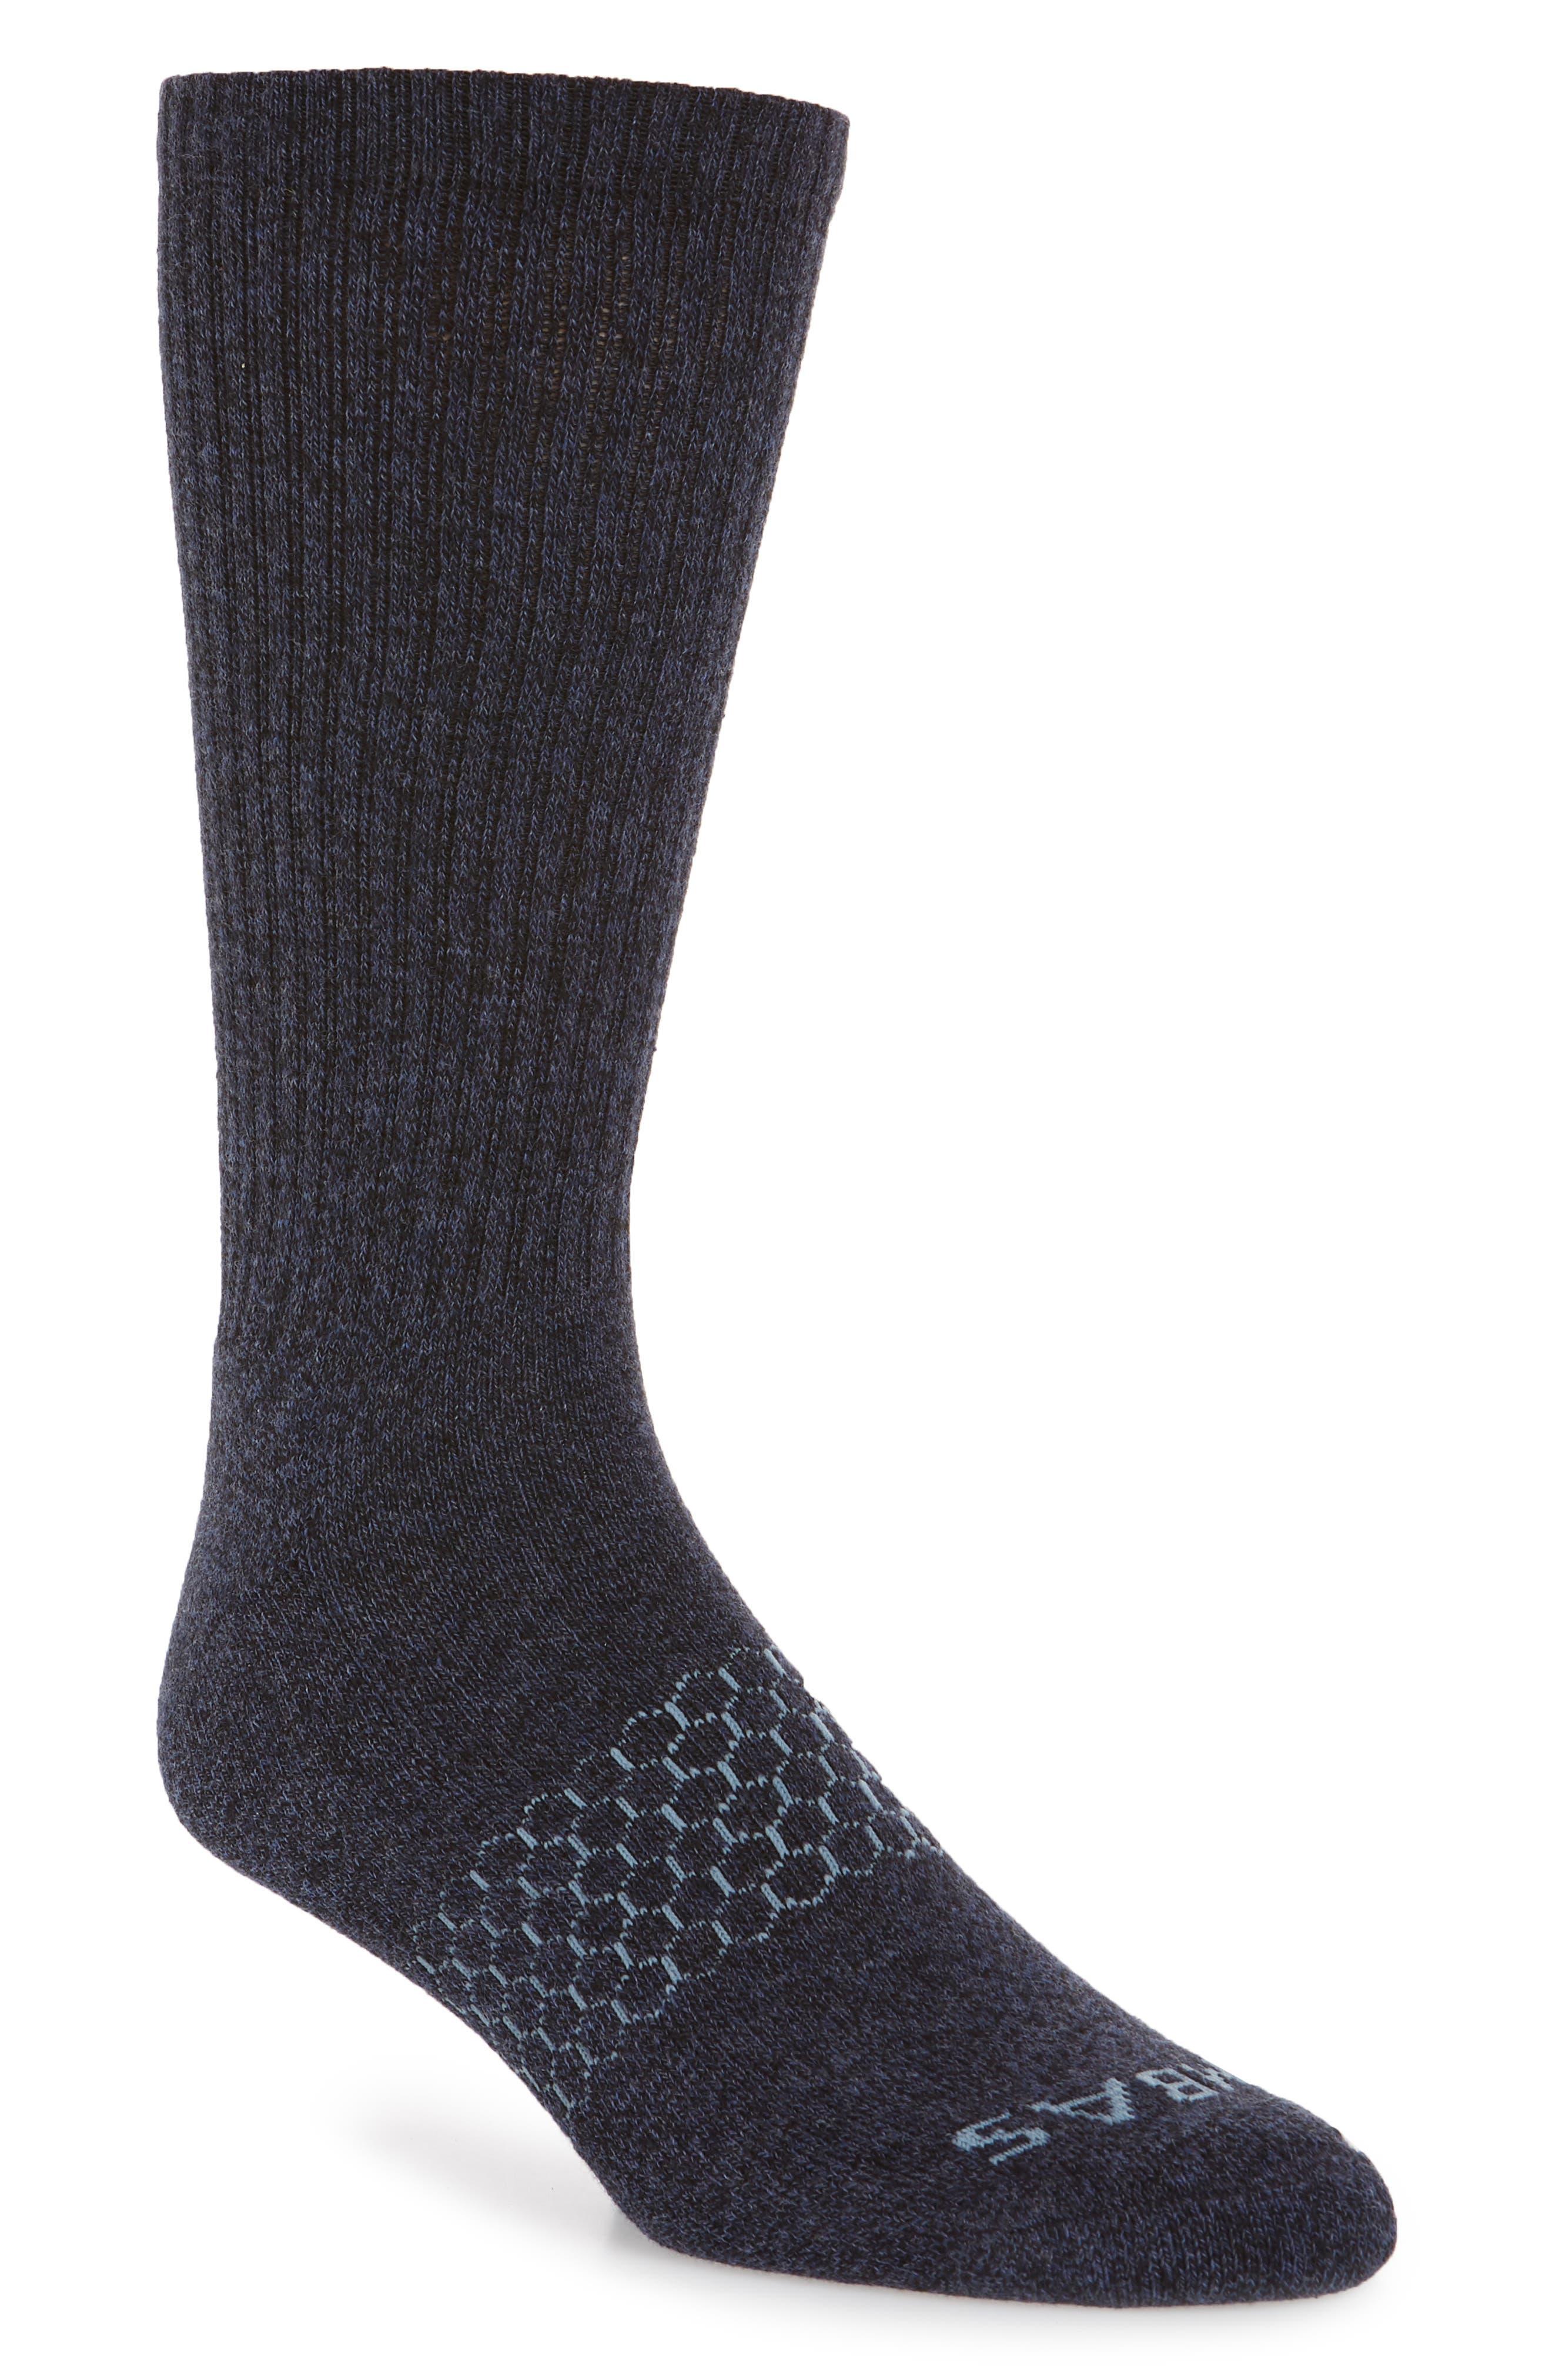 Marl Crew Socks,                         Main,                         color, Navy